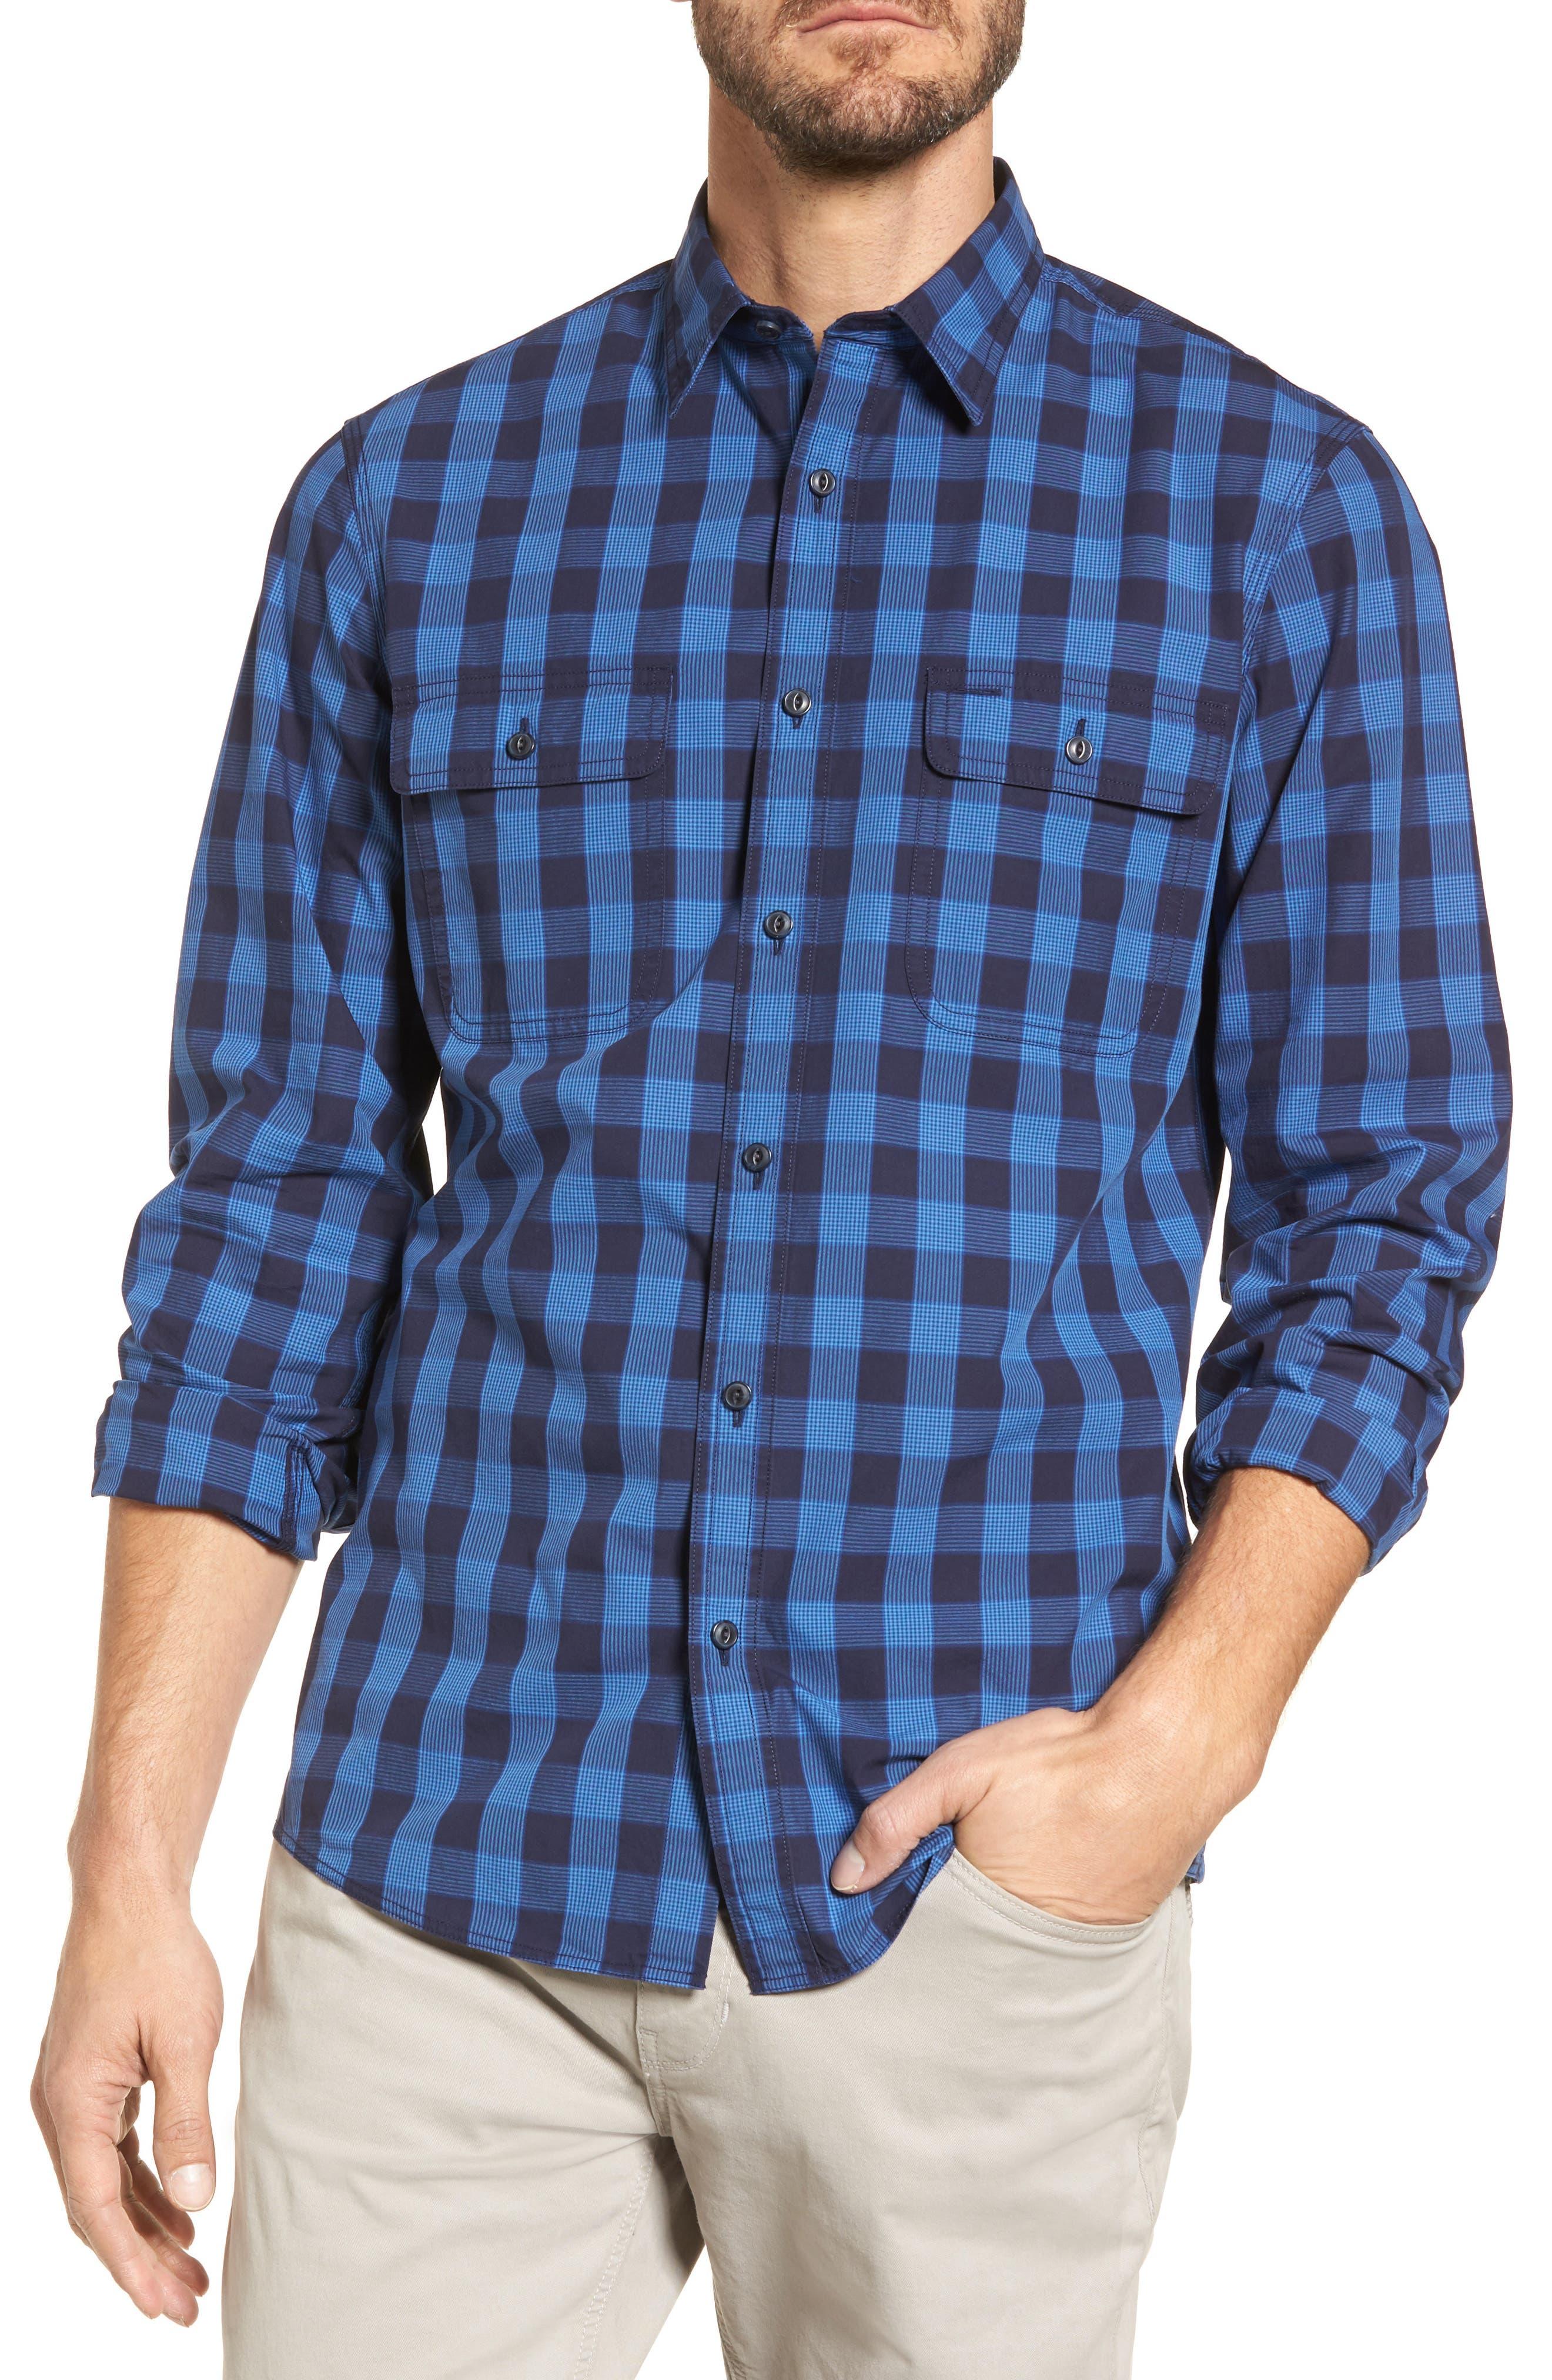 Trim Fit Plaid Trucker Sport Shirt,                         Main,                         color, Navy Iris Blue Check